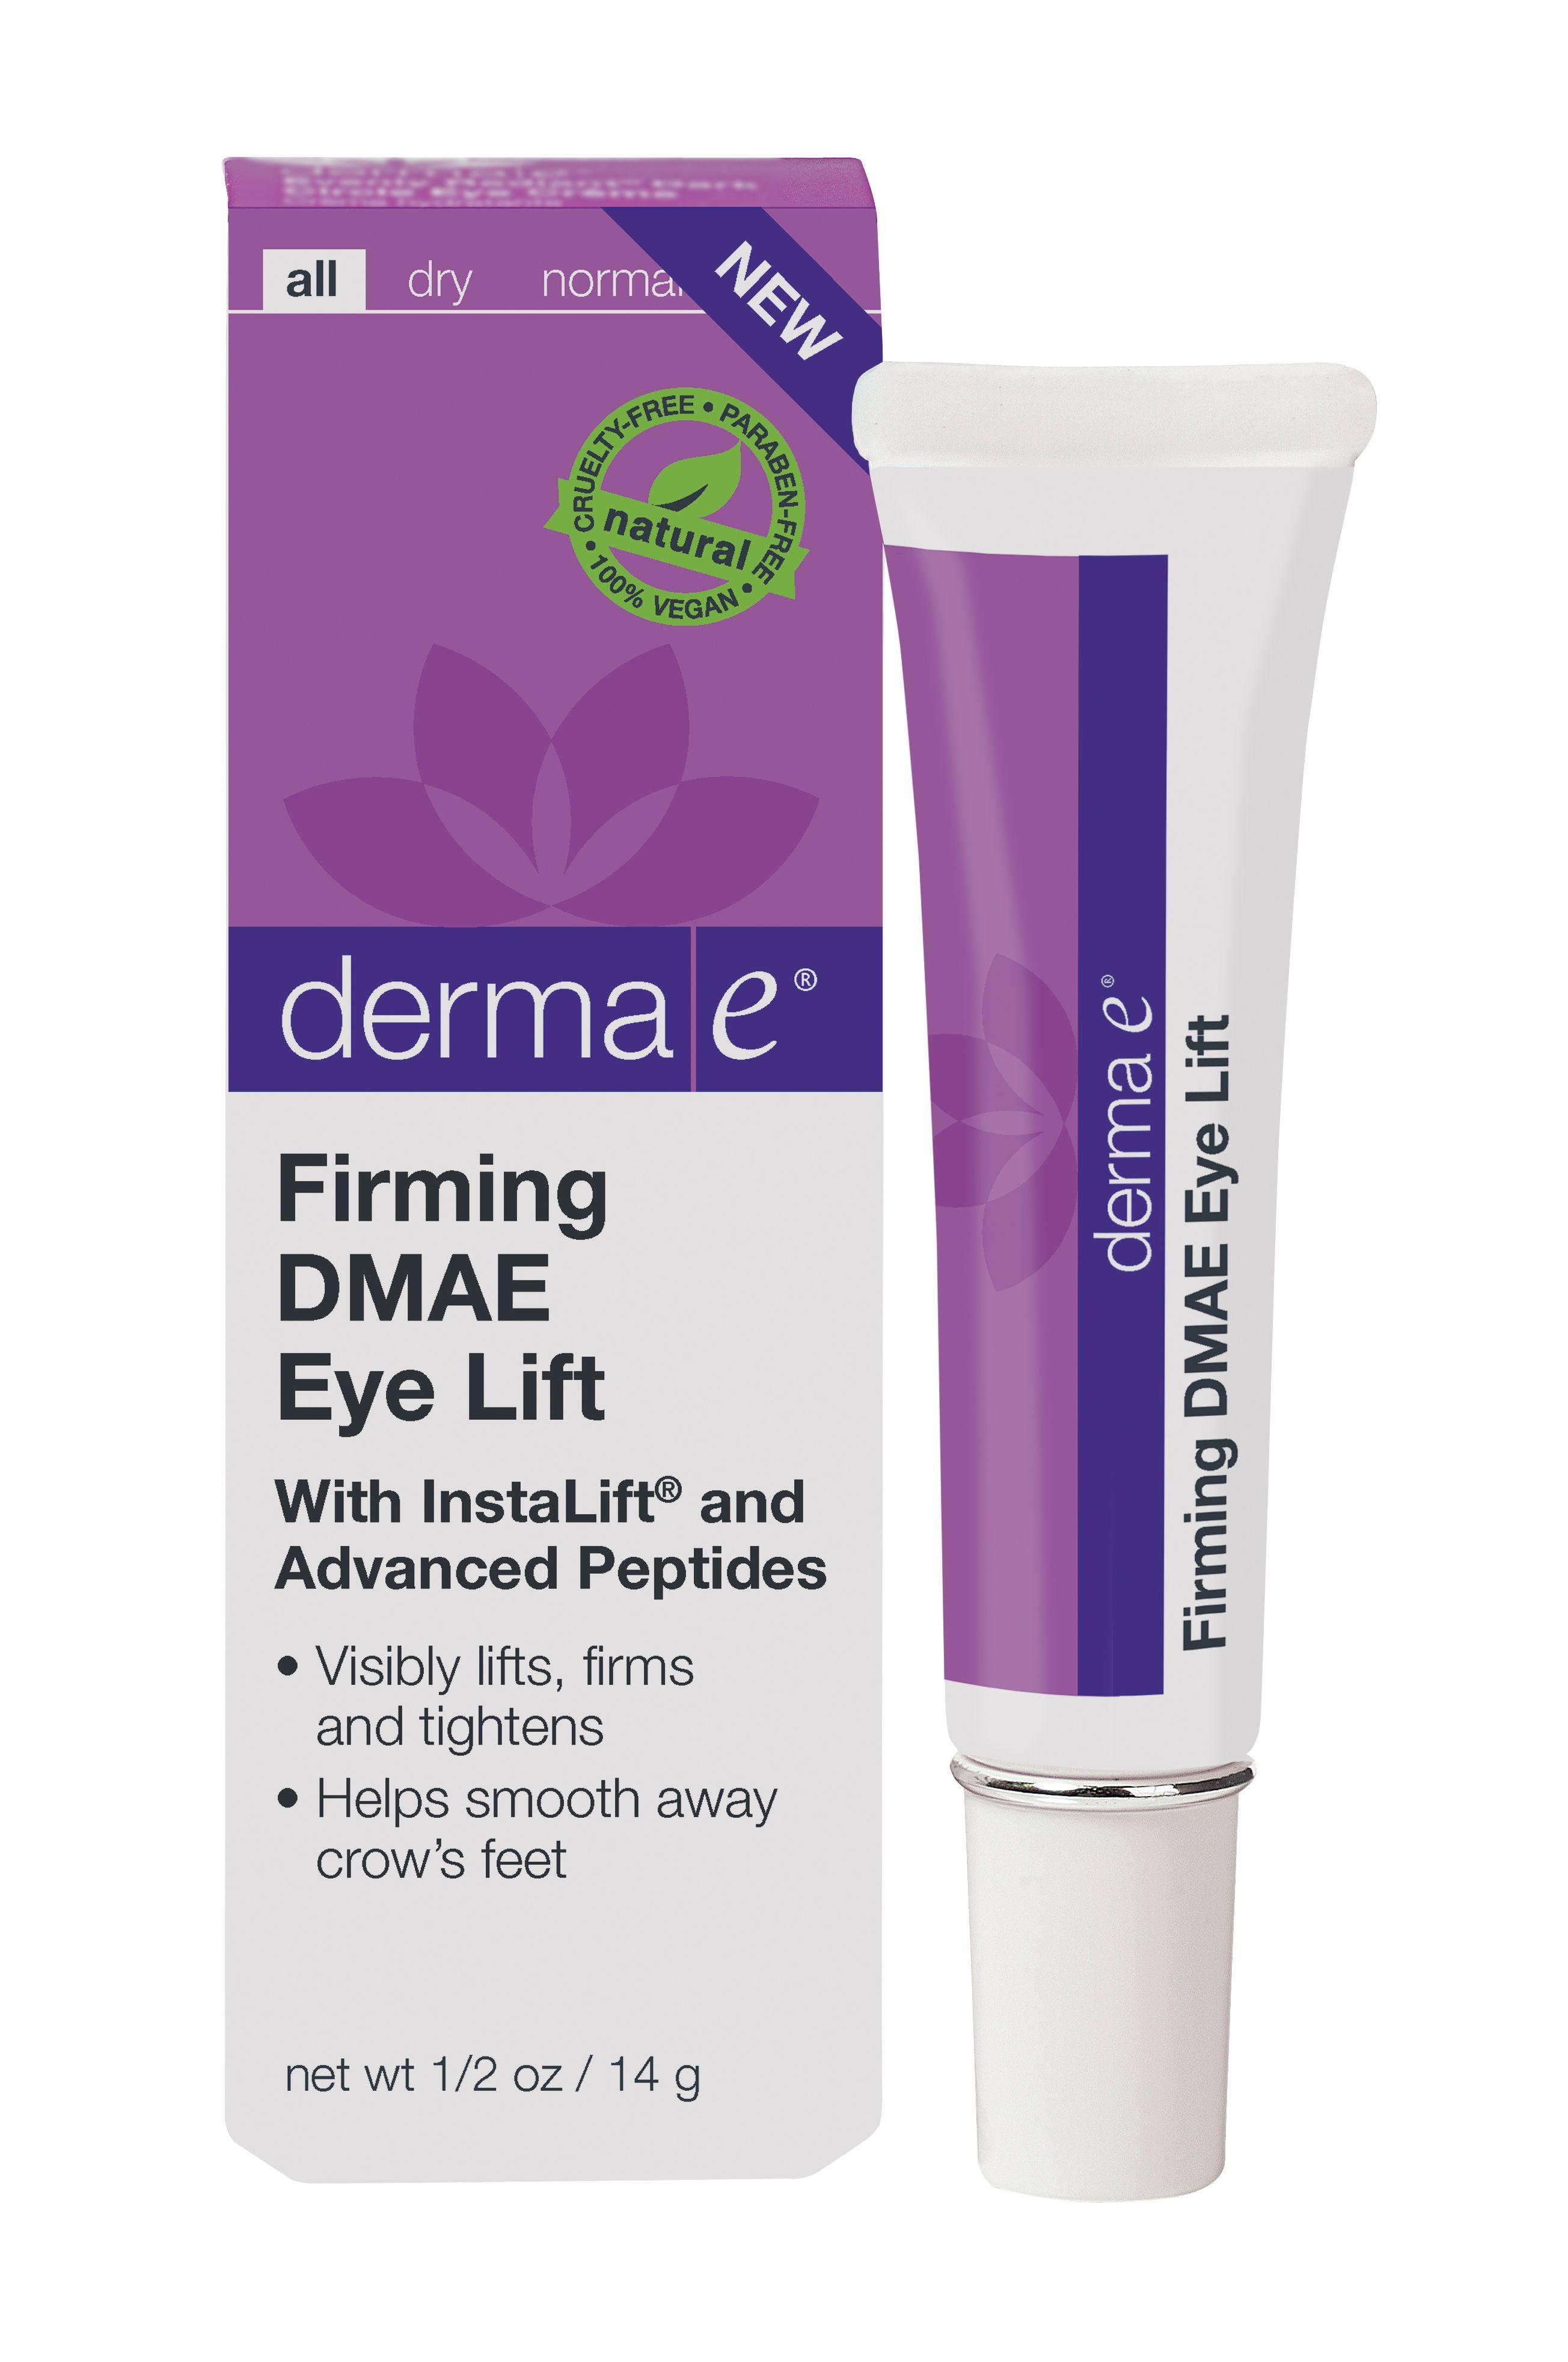 SoMimi Reviews Derma e Firming DMAE Eye Lift  Do You Care  For